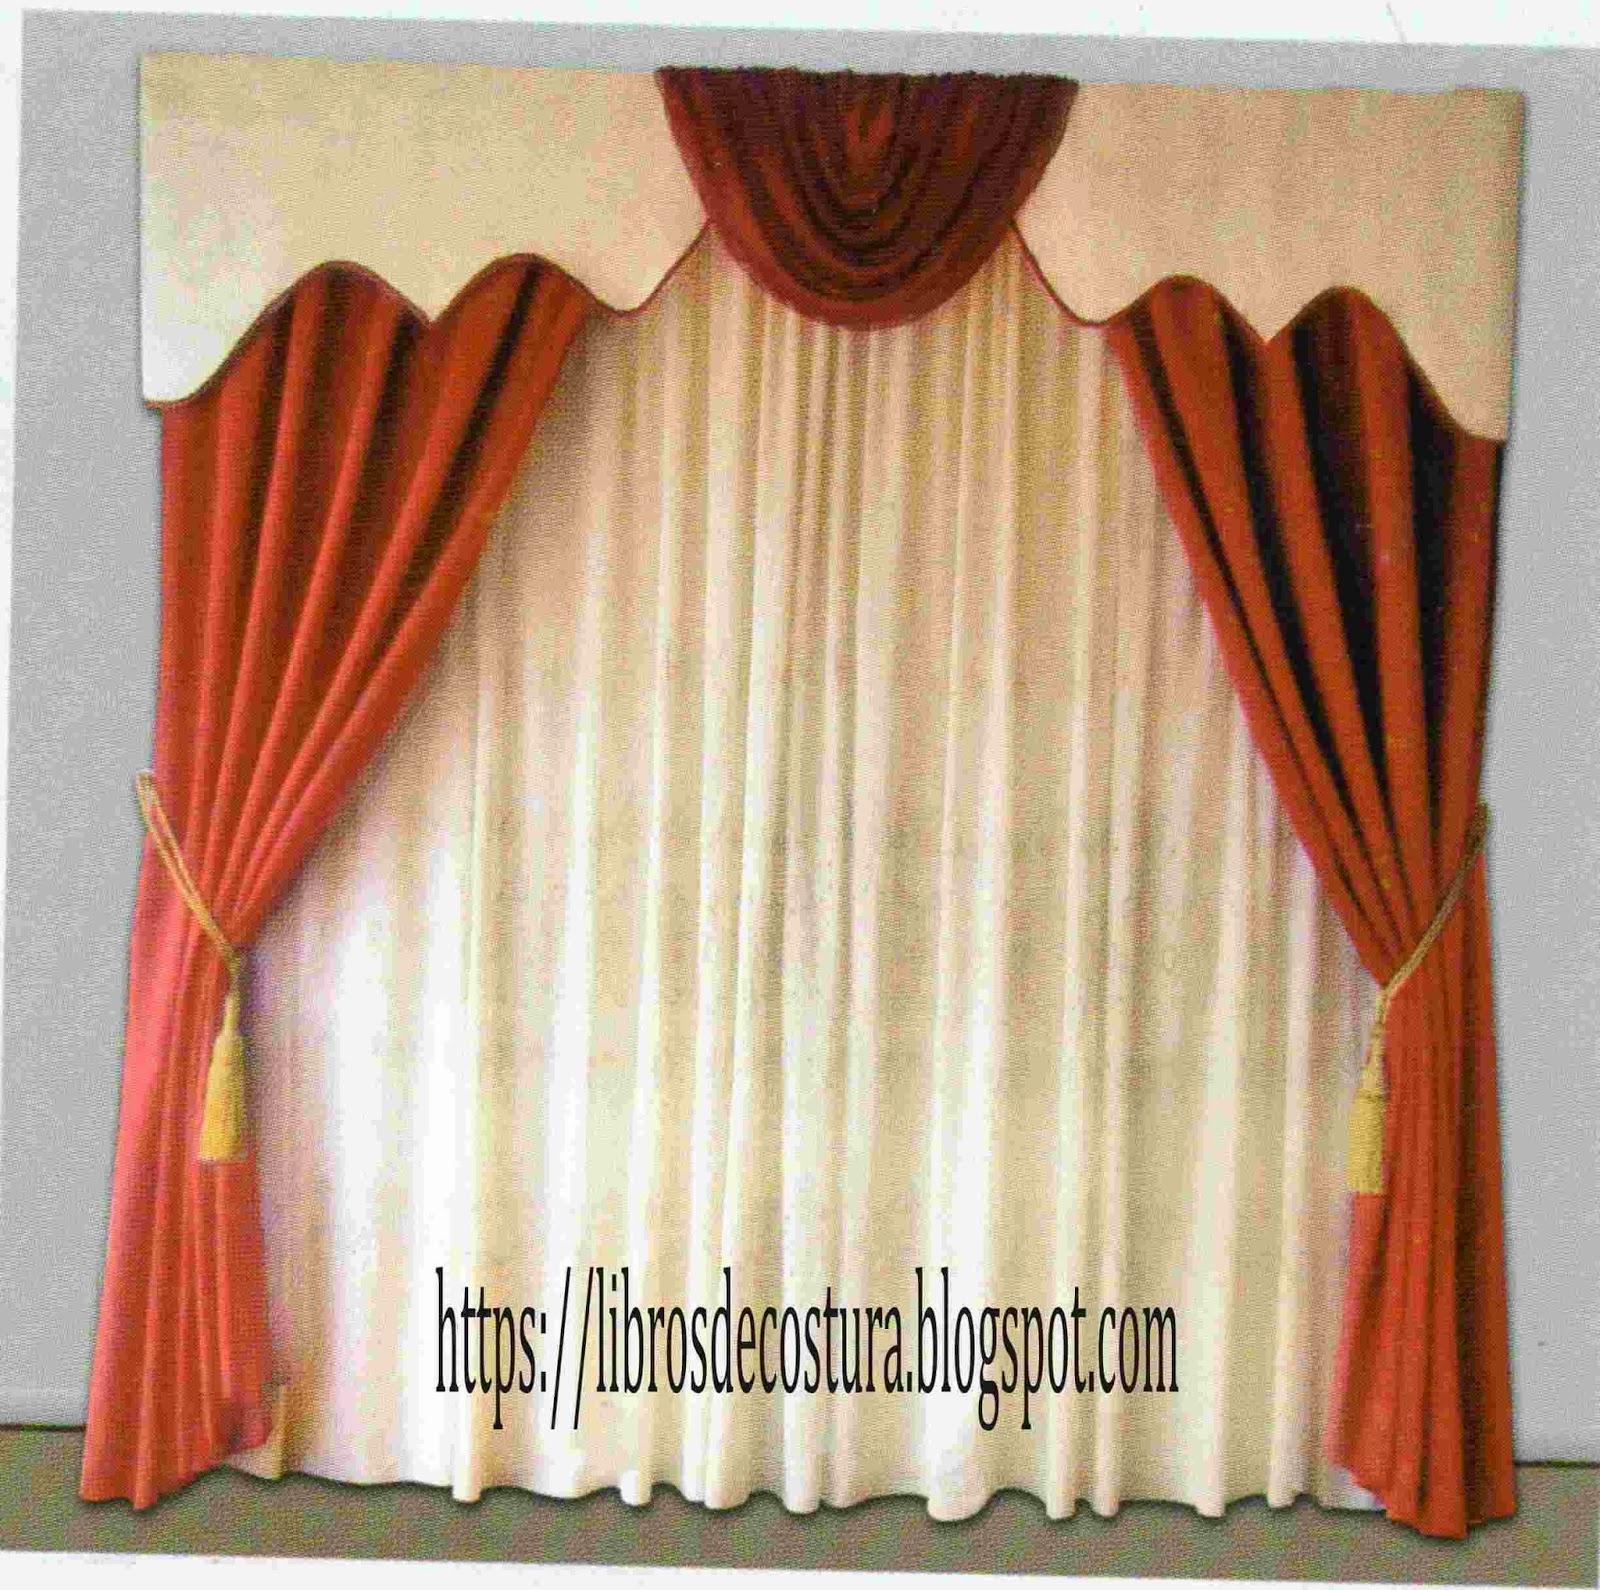 Libros de costura como hacer cortinas paso a paso for Cortinas en comedor